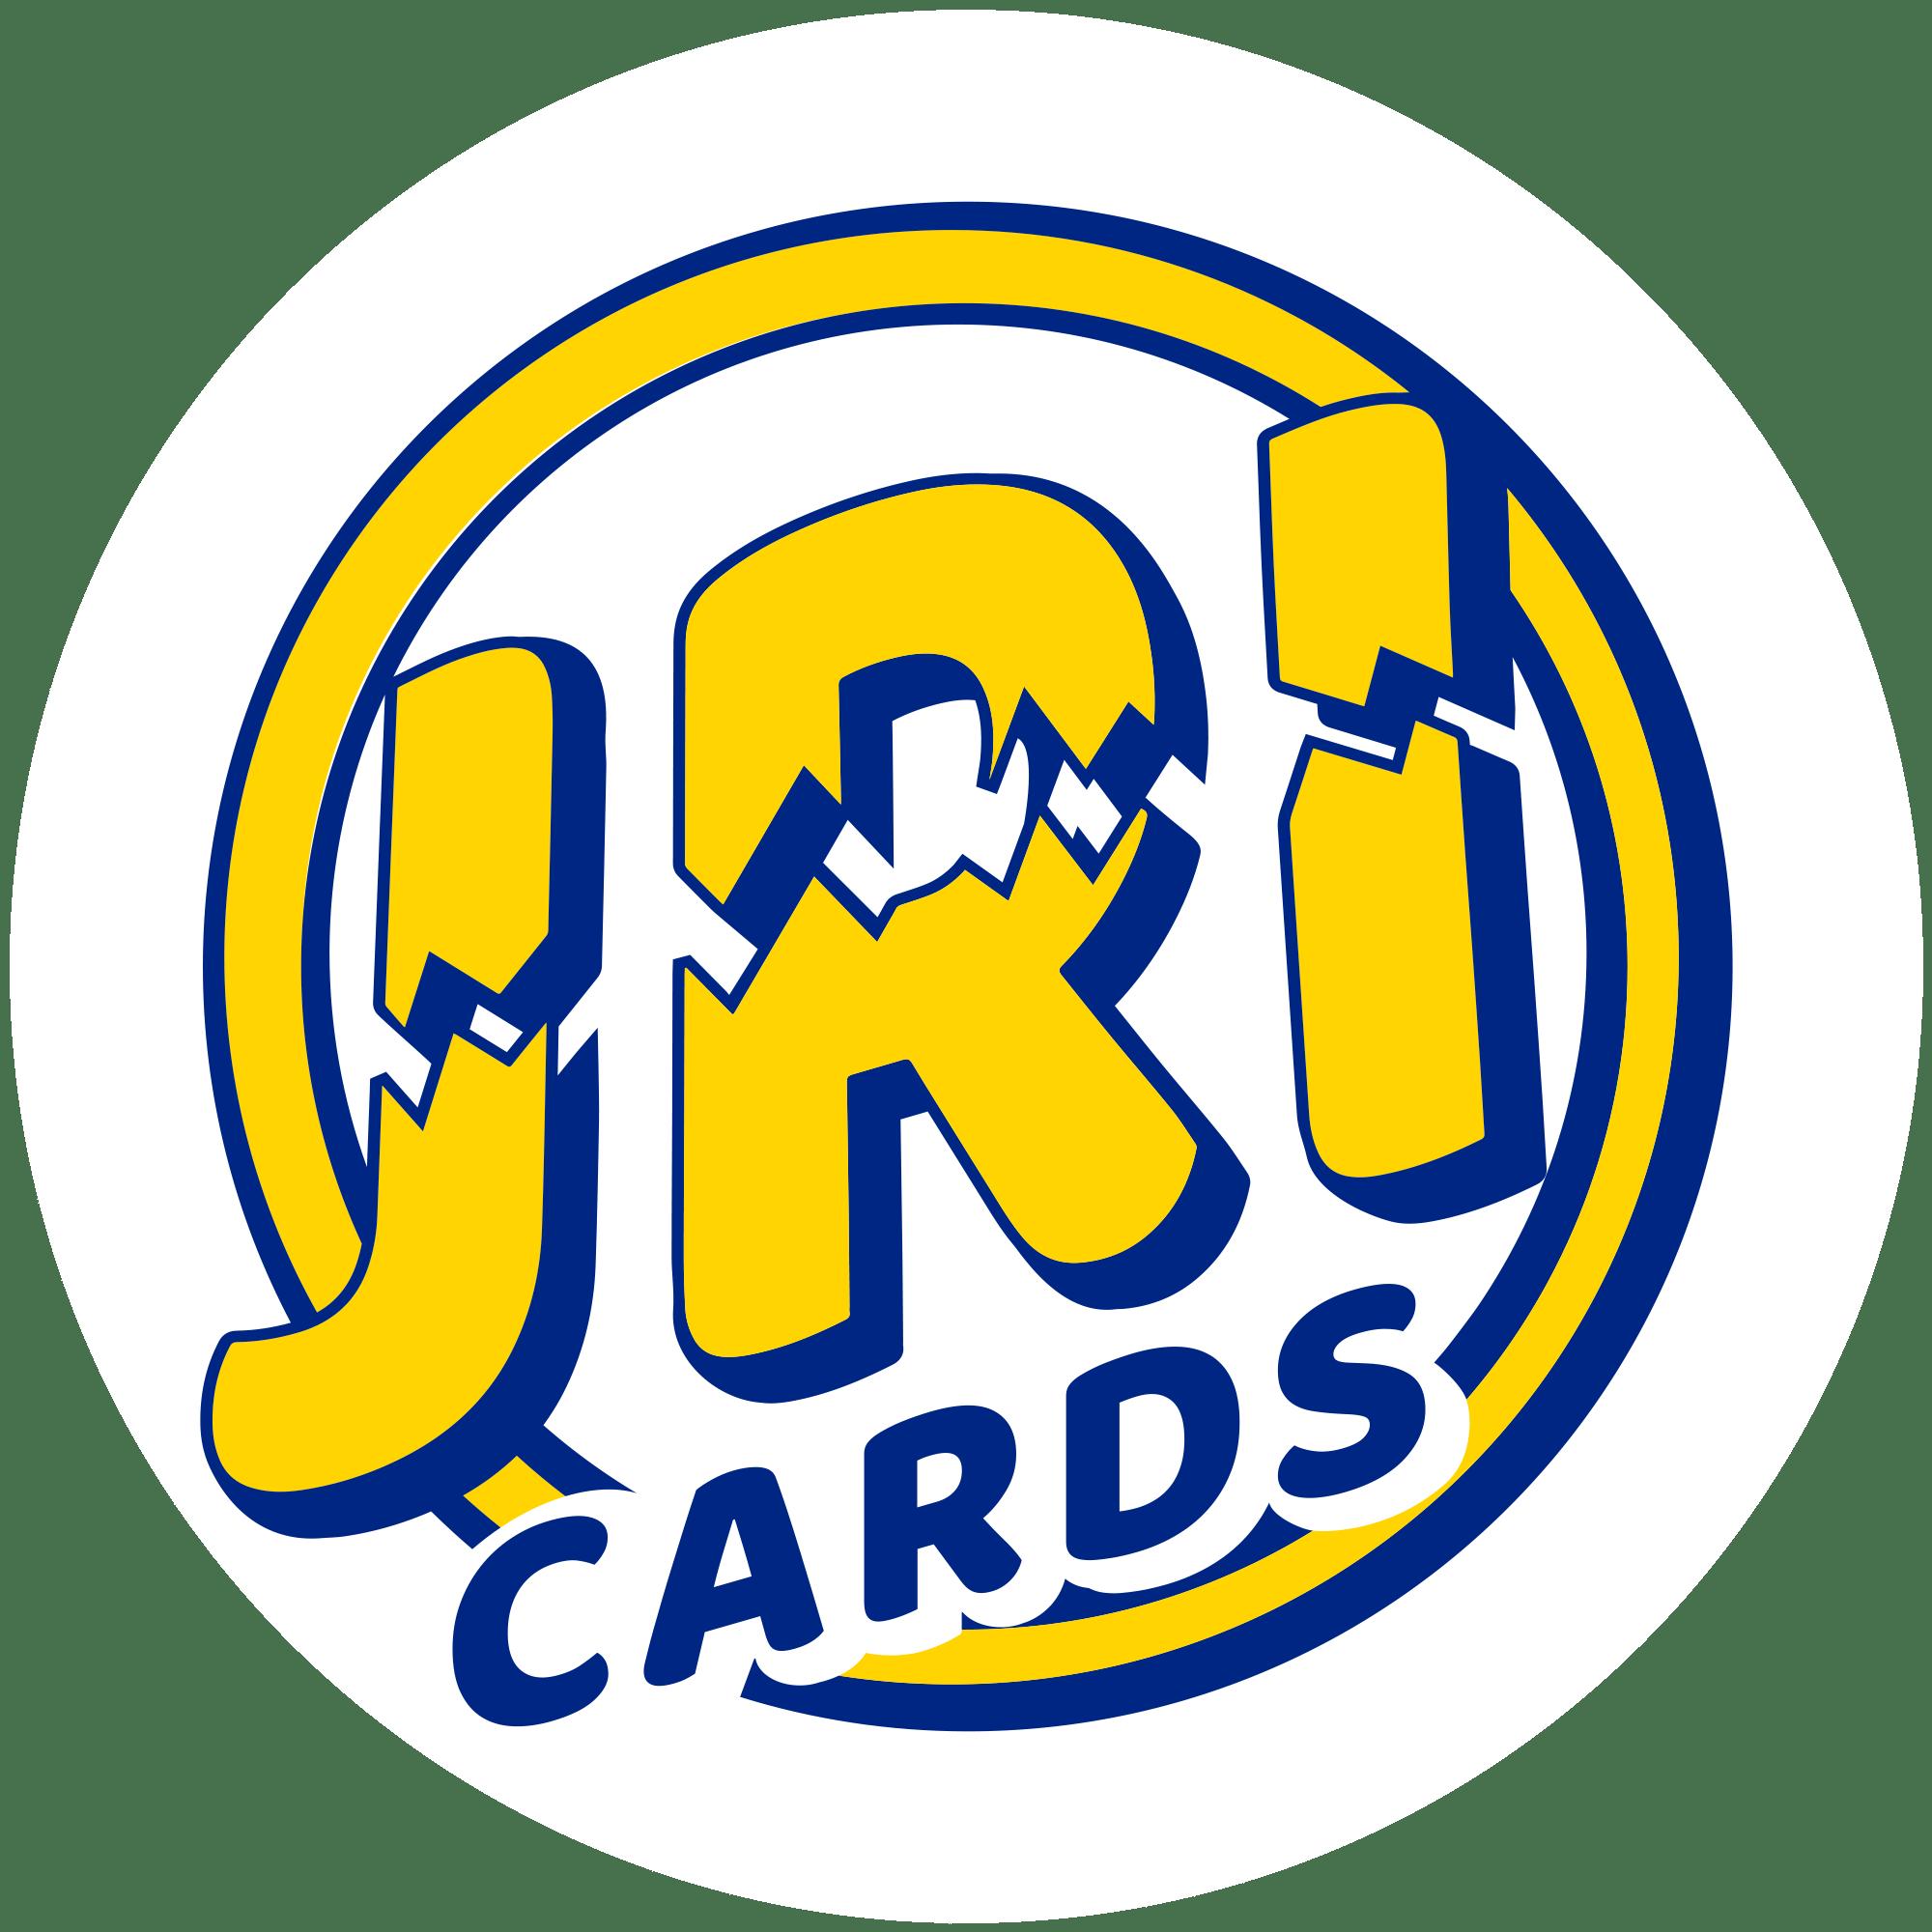 2019 PANINI CERTIFIED BASKETBALL HOBBY BOX (10 PACKS AVAILABLE)